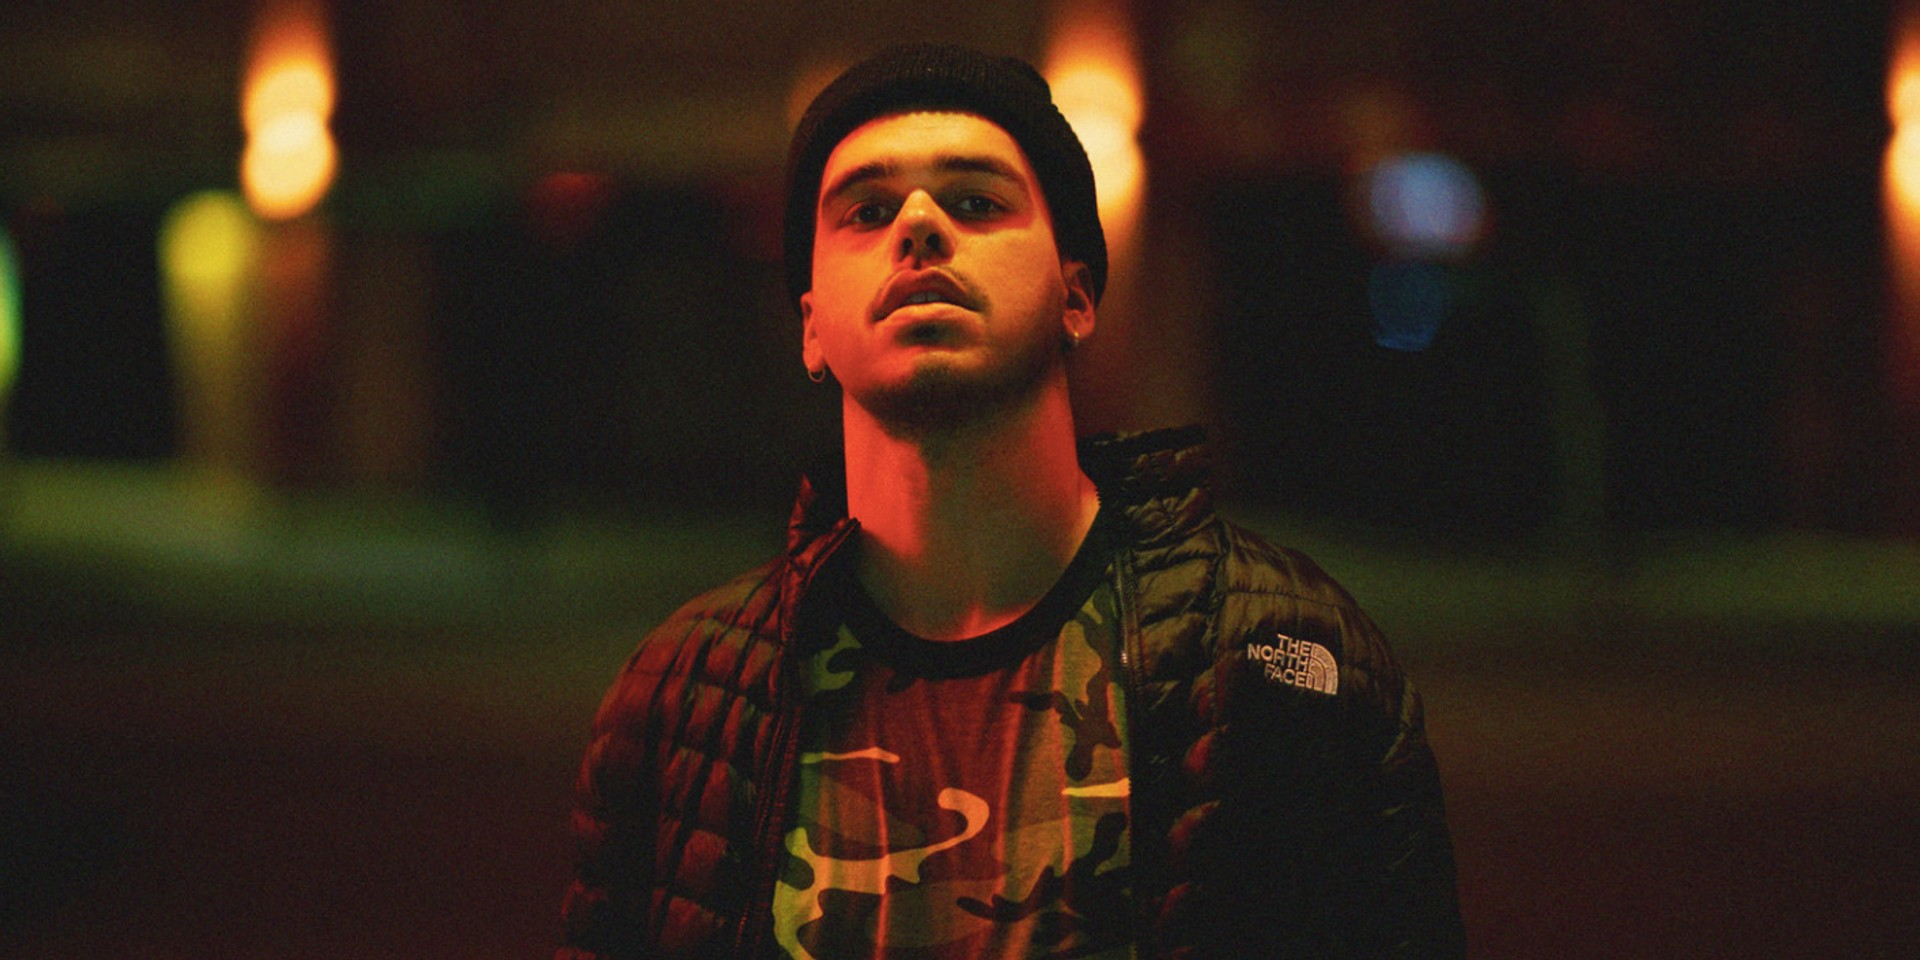 Falcons lists his six Southern hip-hop essentials